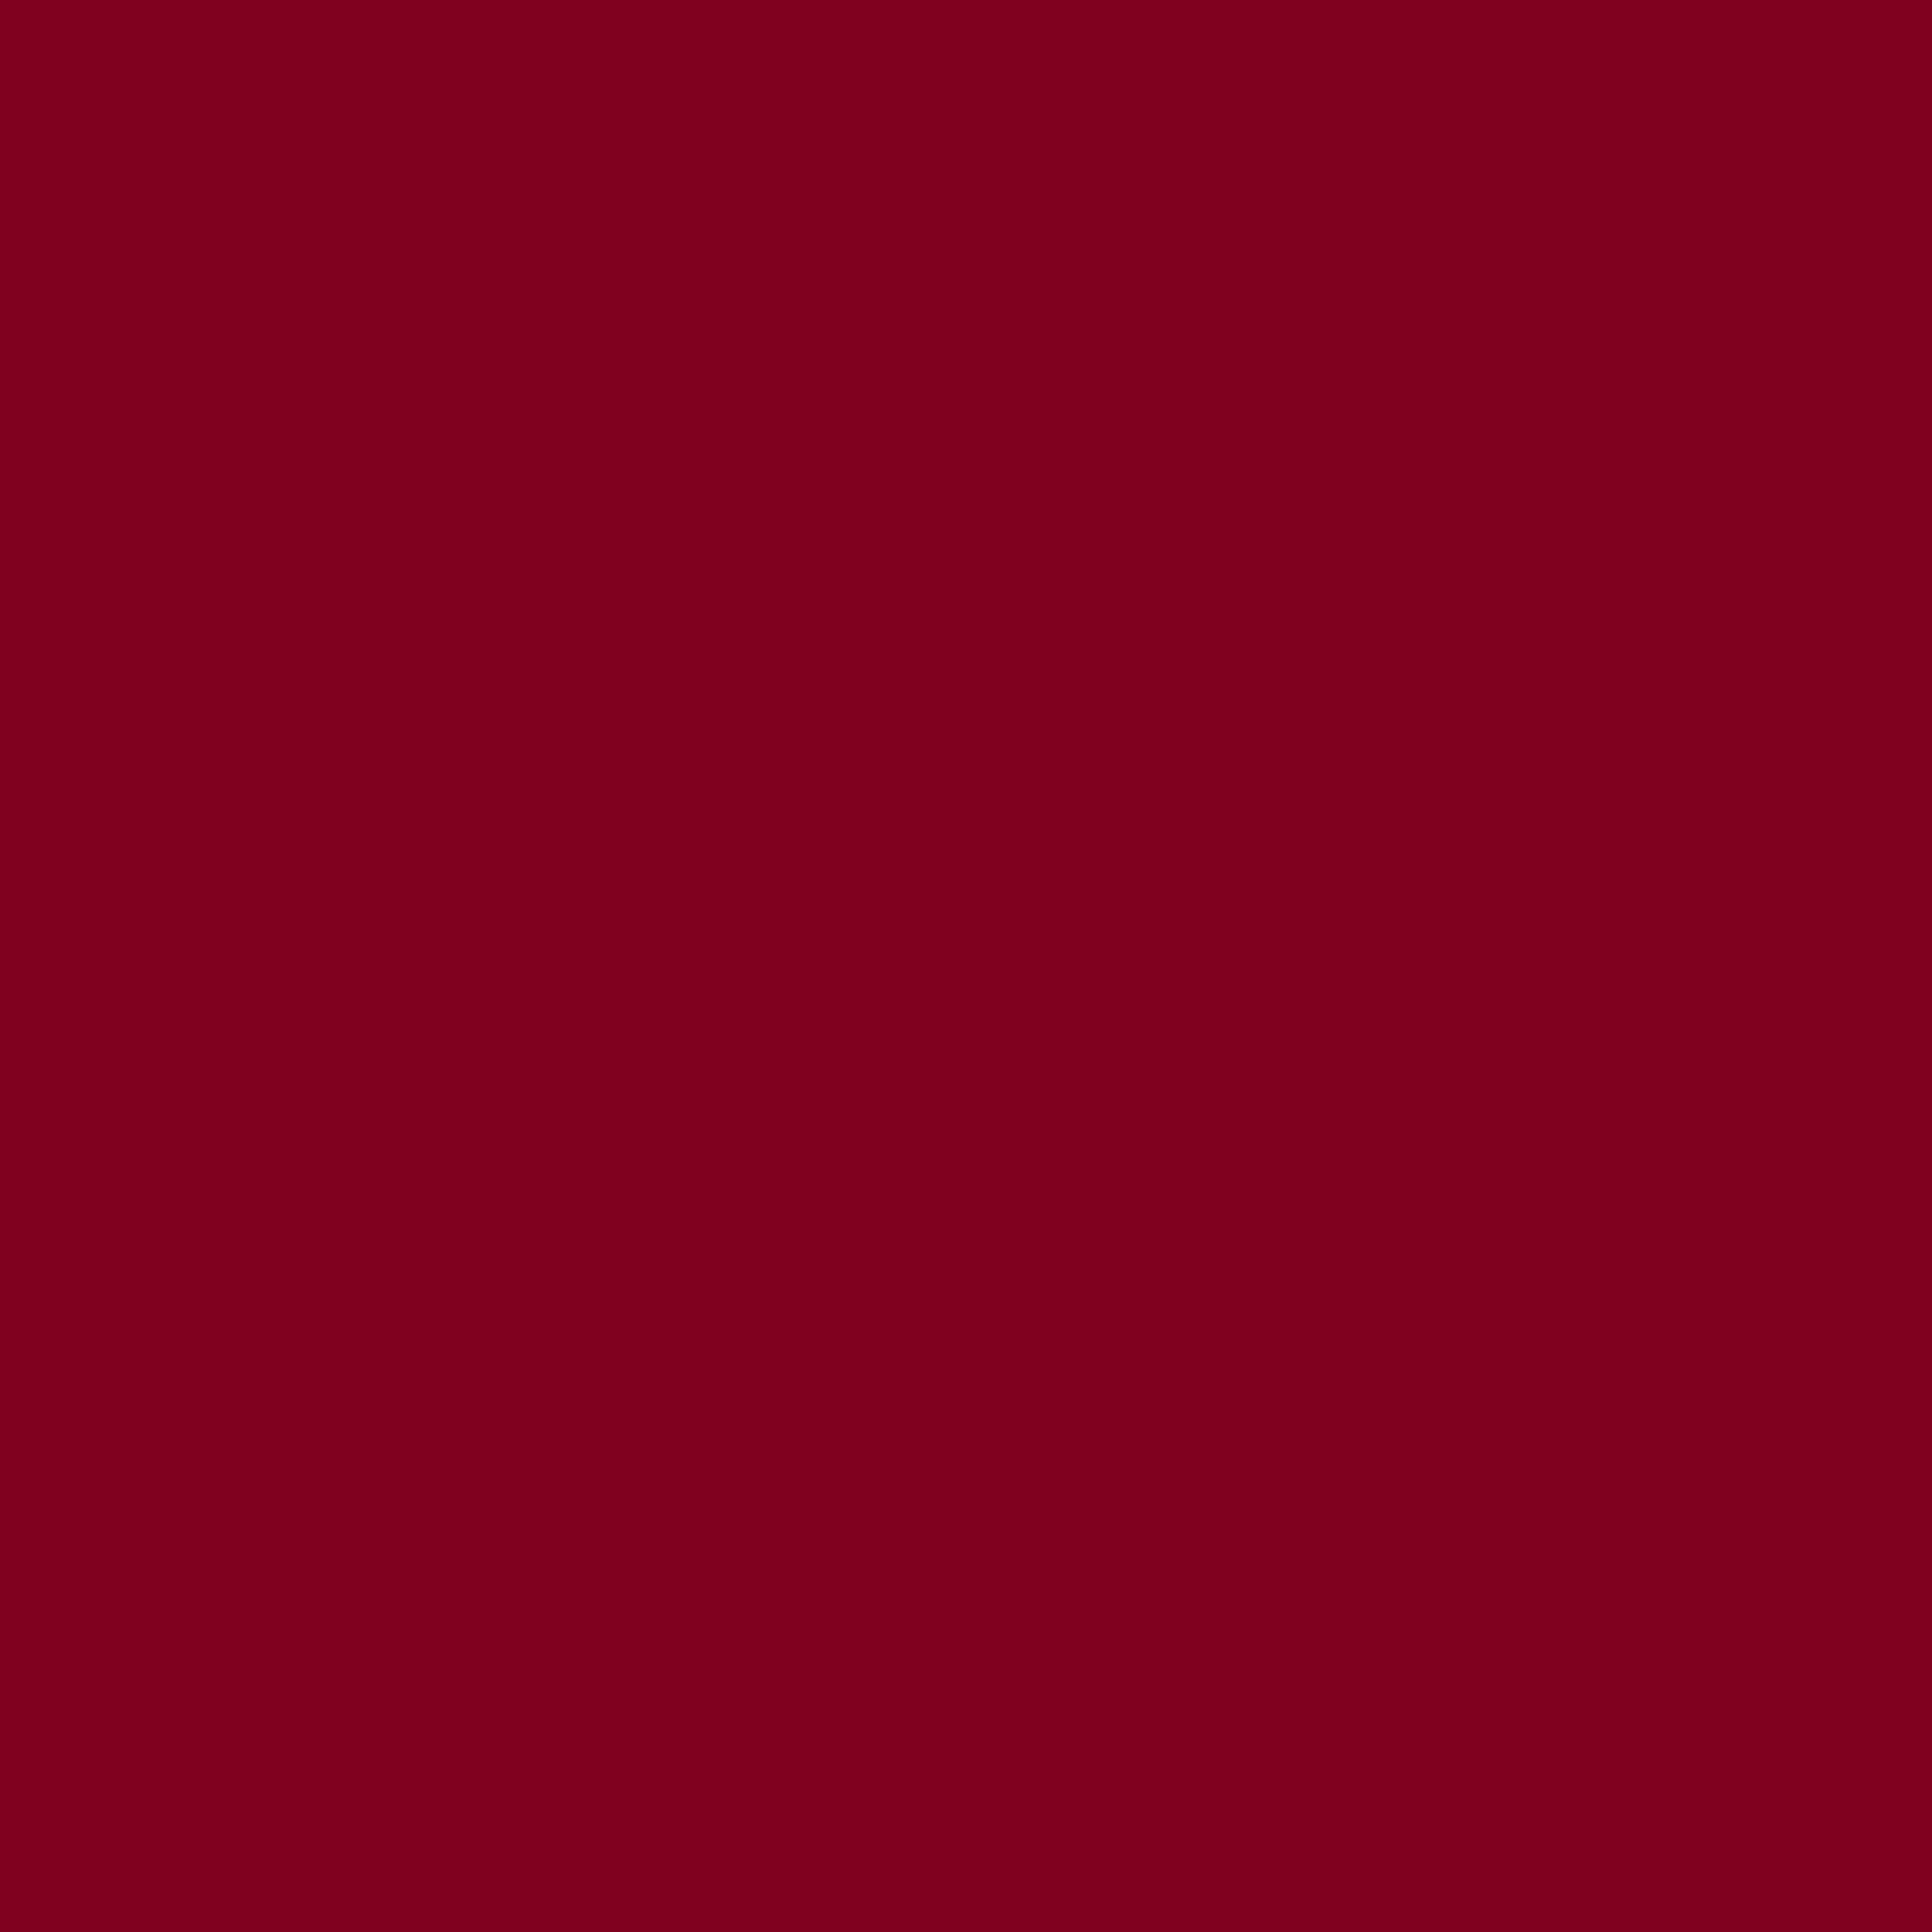 2048x2048 Burgundy Solid Color Background